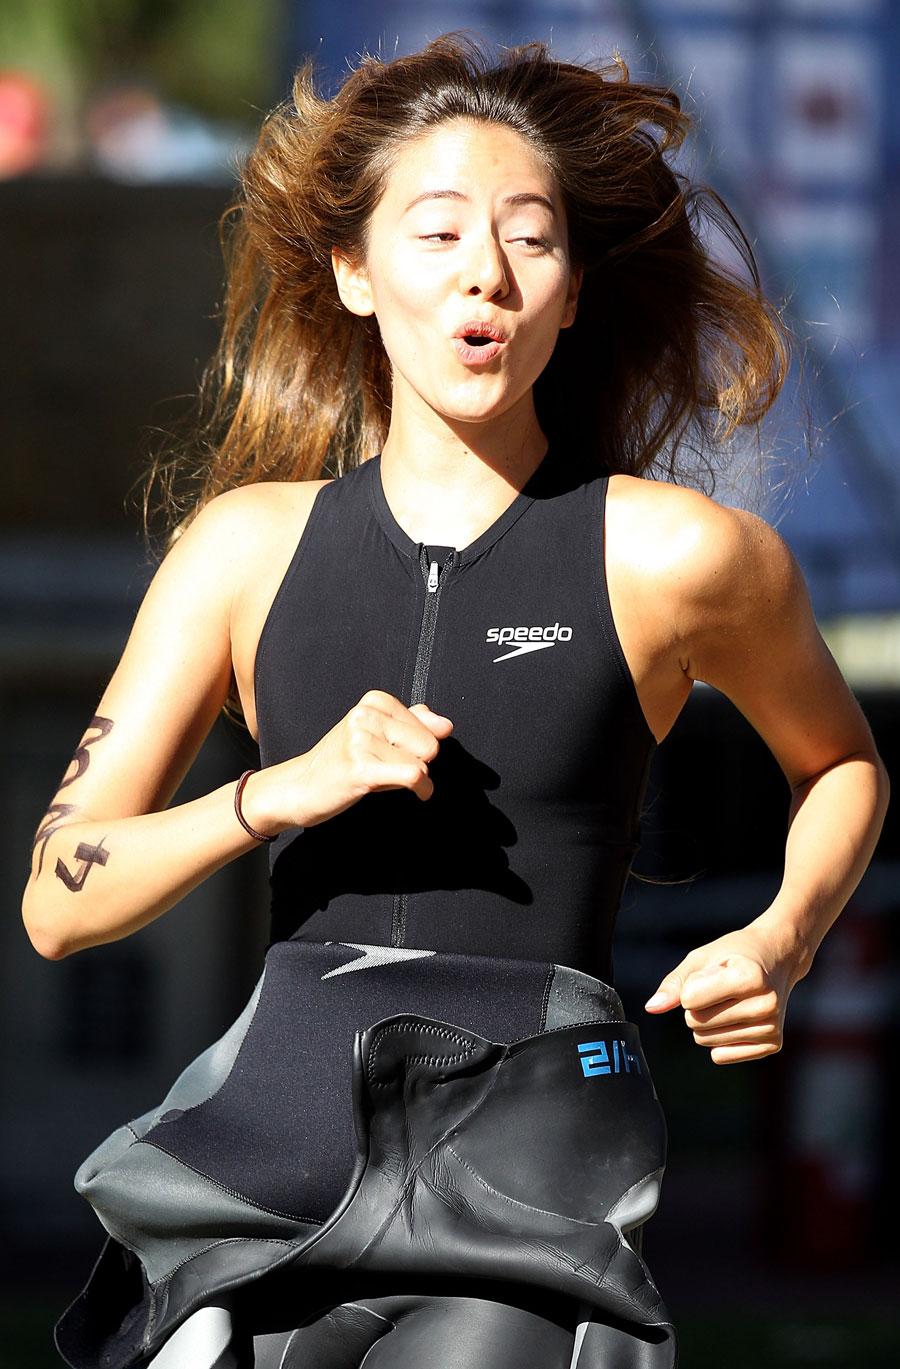 Jessica Michibata takes part in the City of Rockingham Triathlon